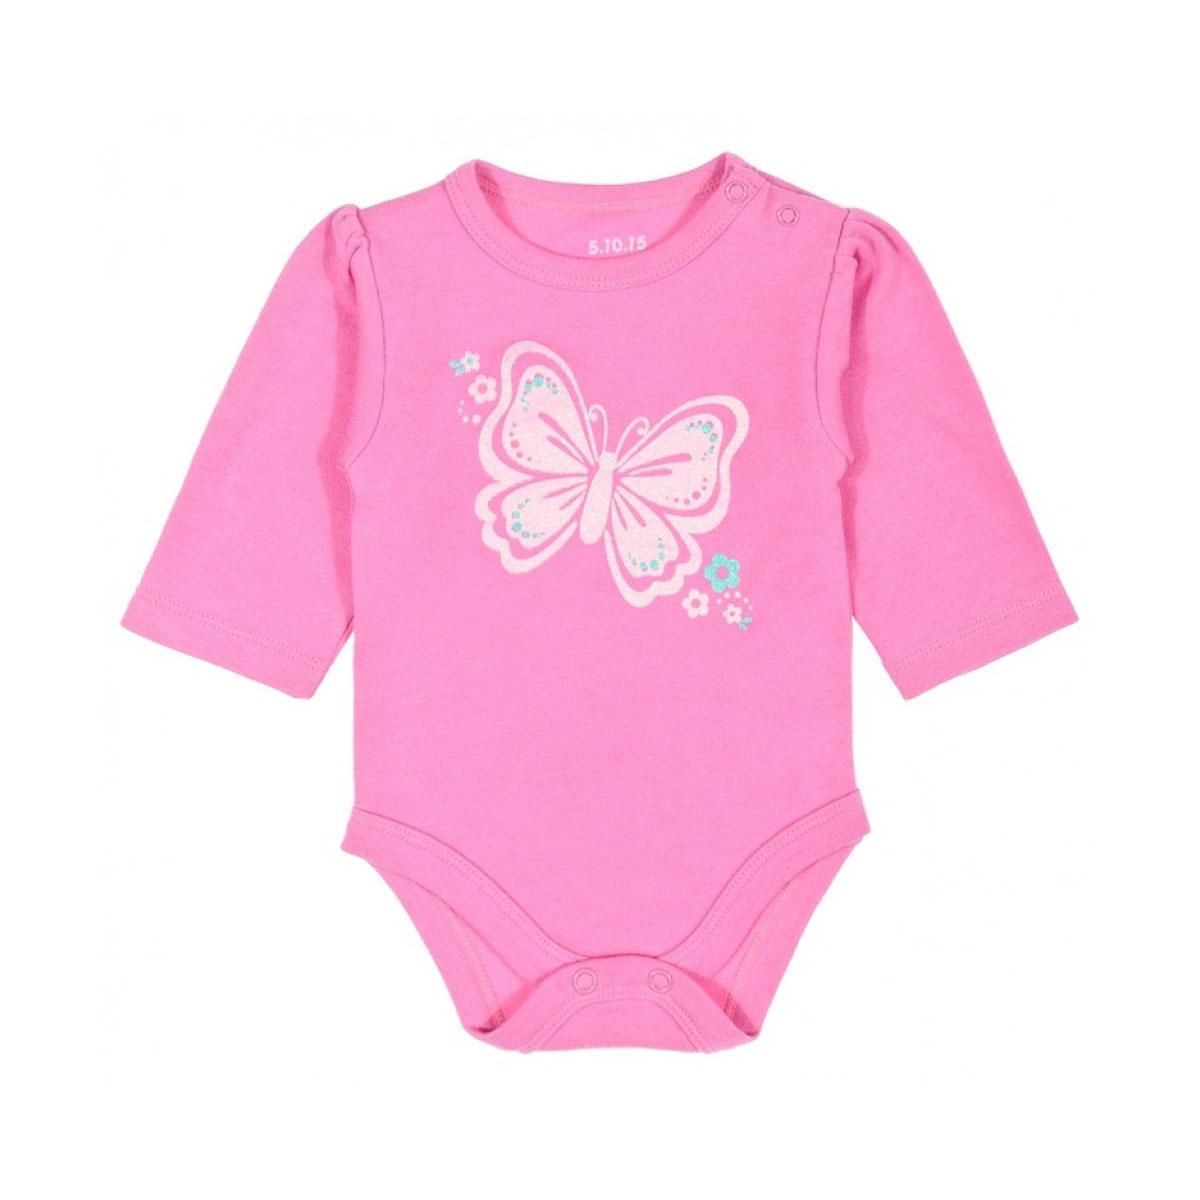 Боди 5.10.15 розовое с бабочкой Размер 80<br>